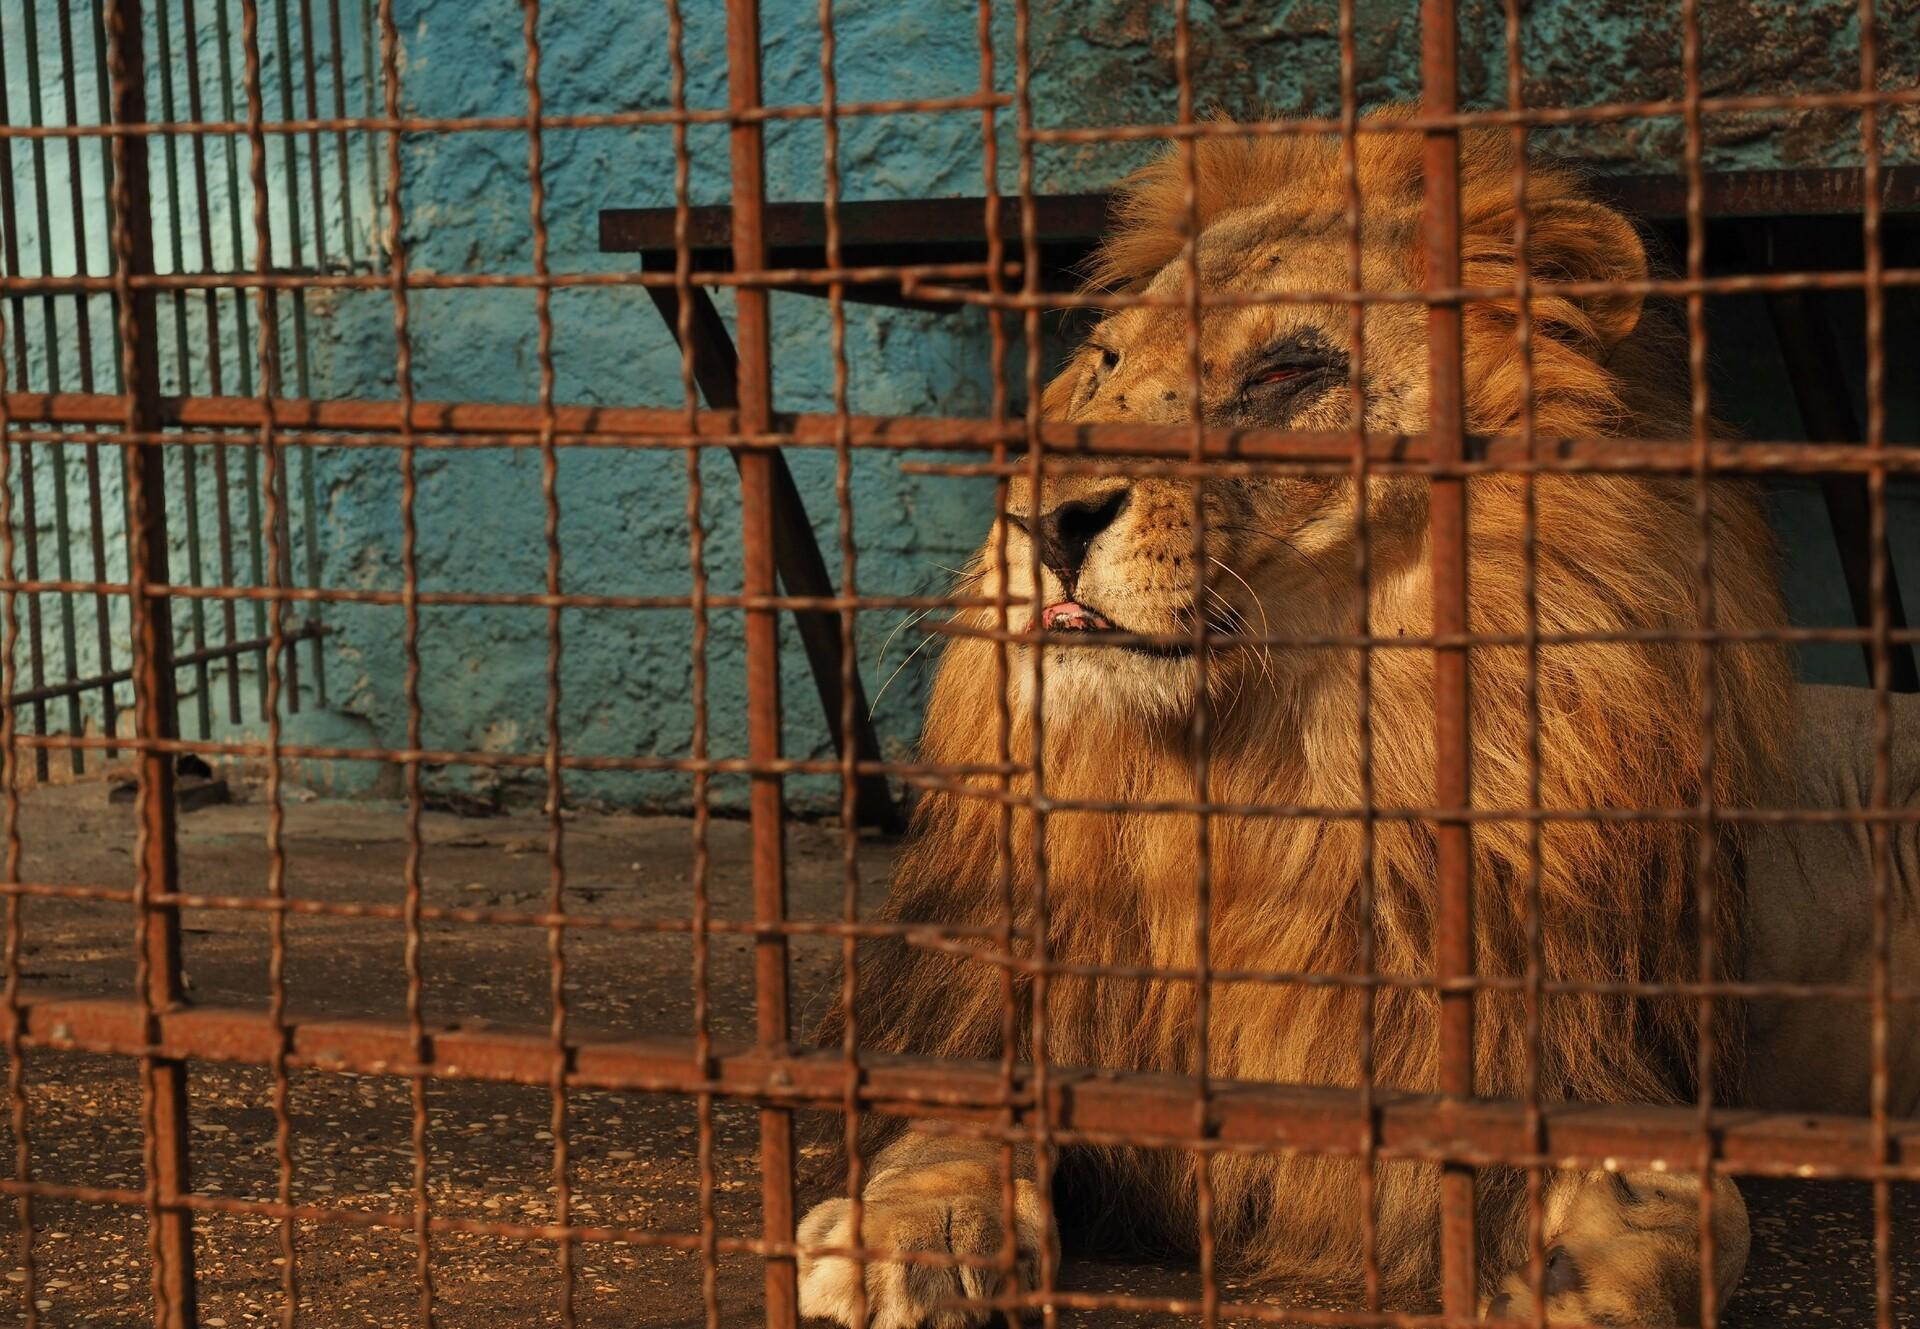 Lion at Safari Park Zoo, Albania